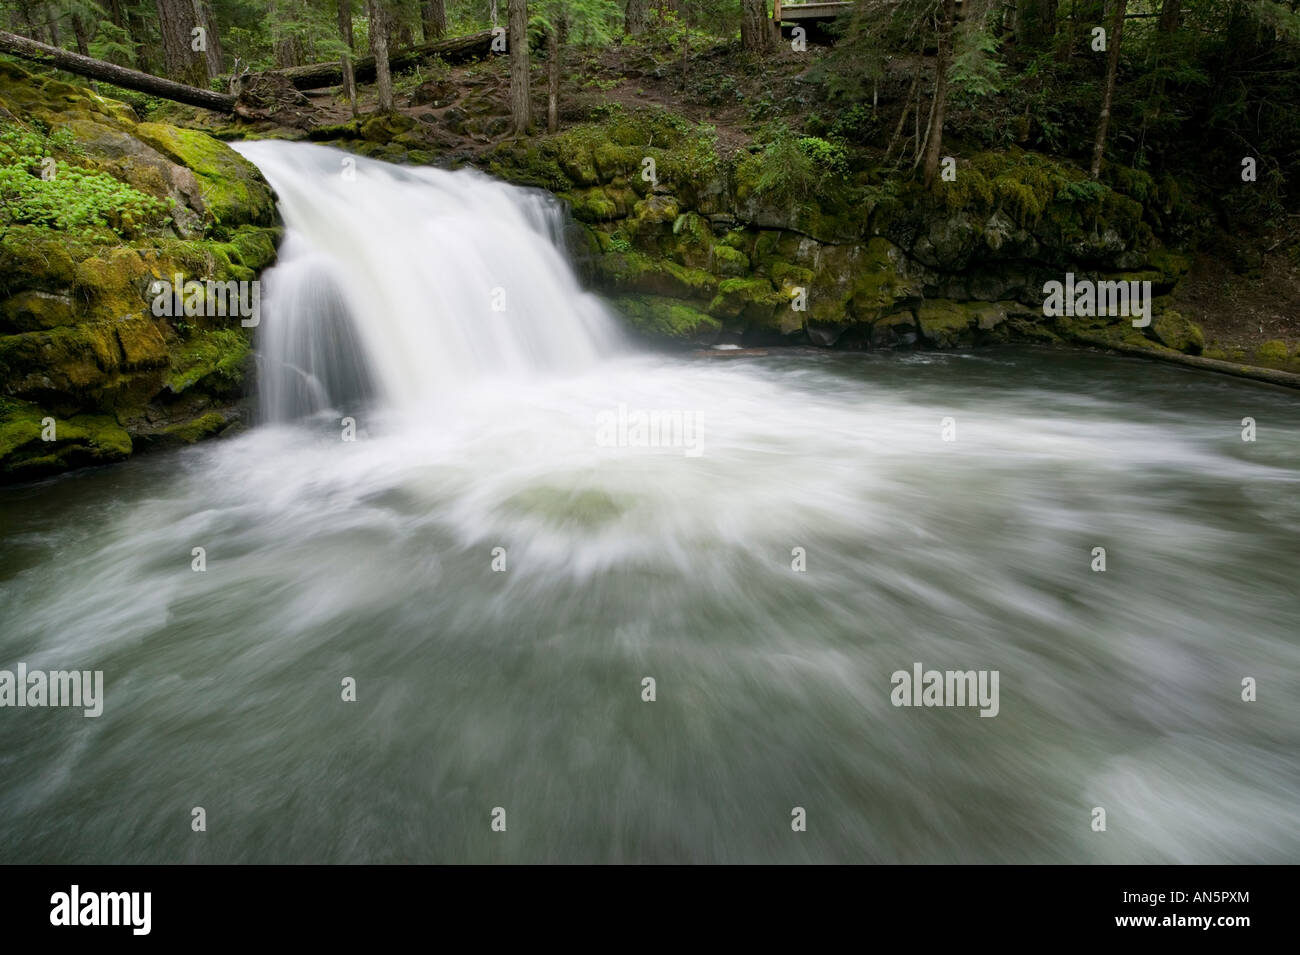 Whitehorse falls - Stock Image